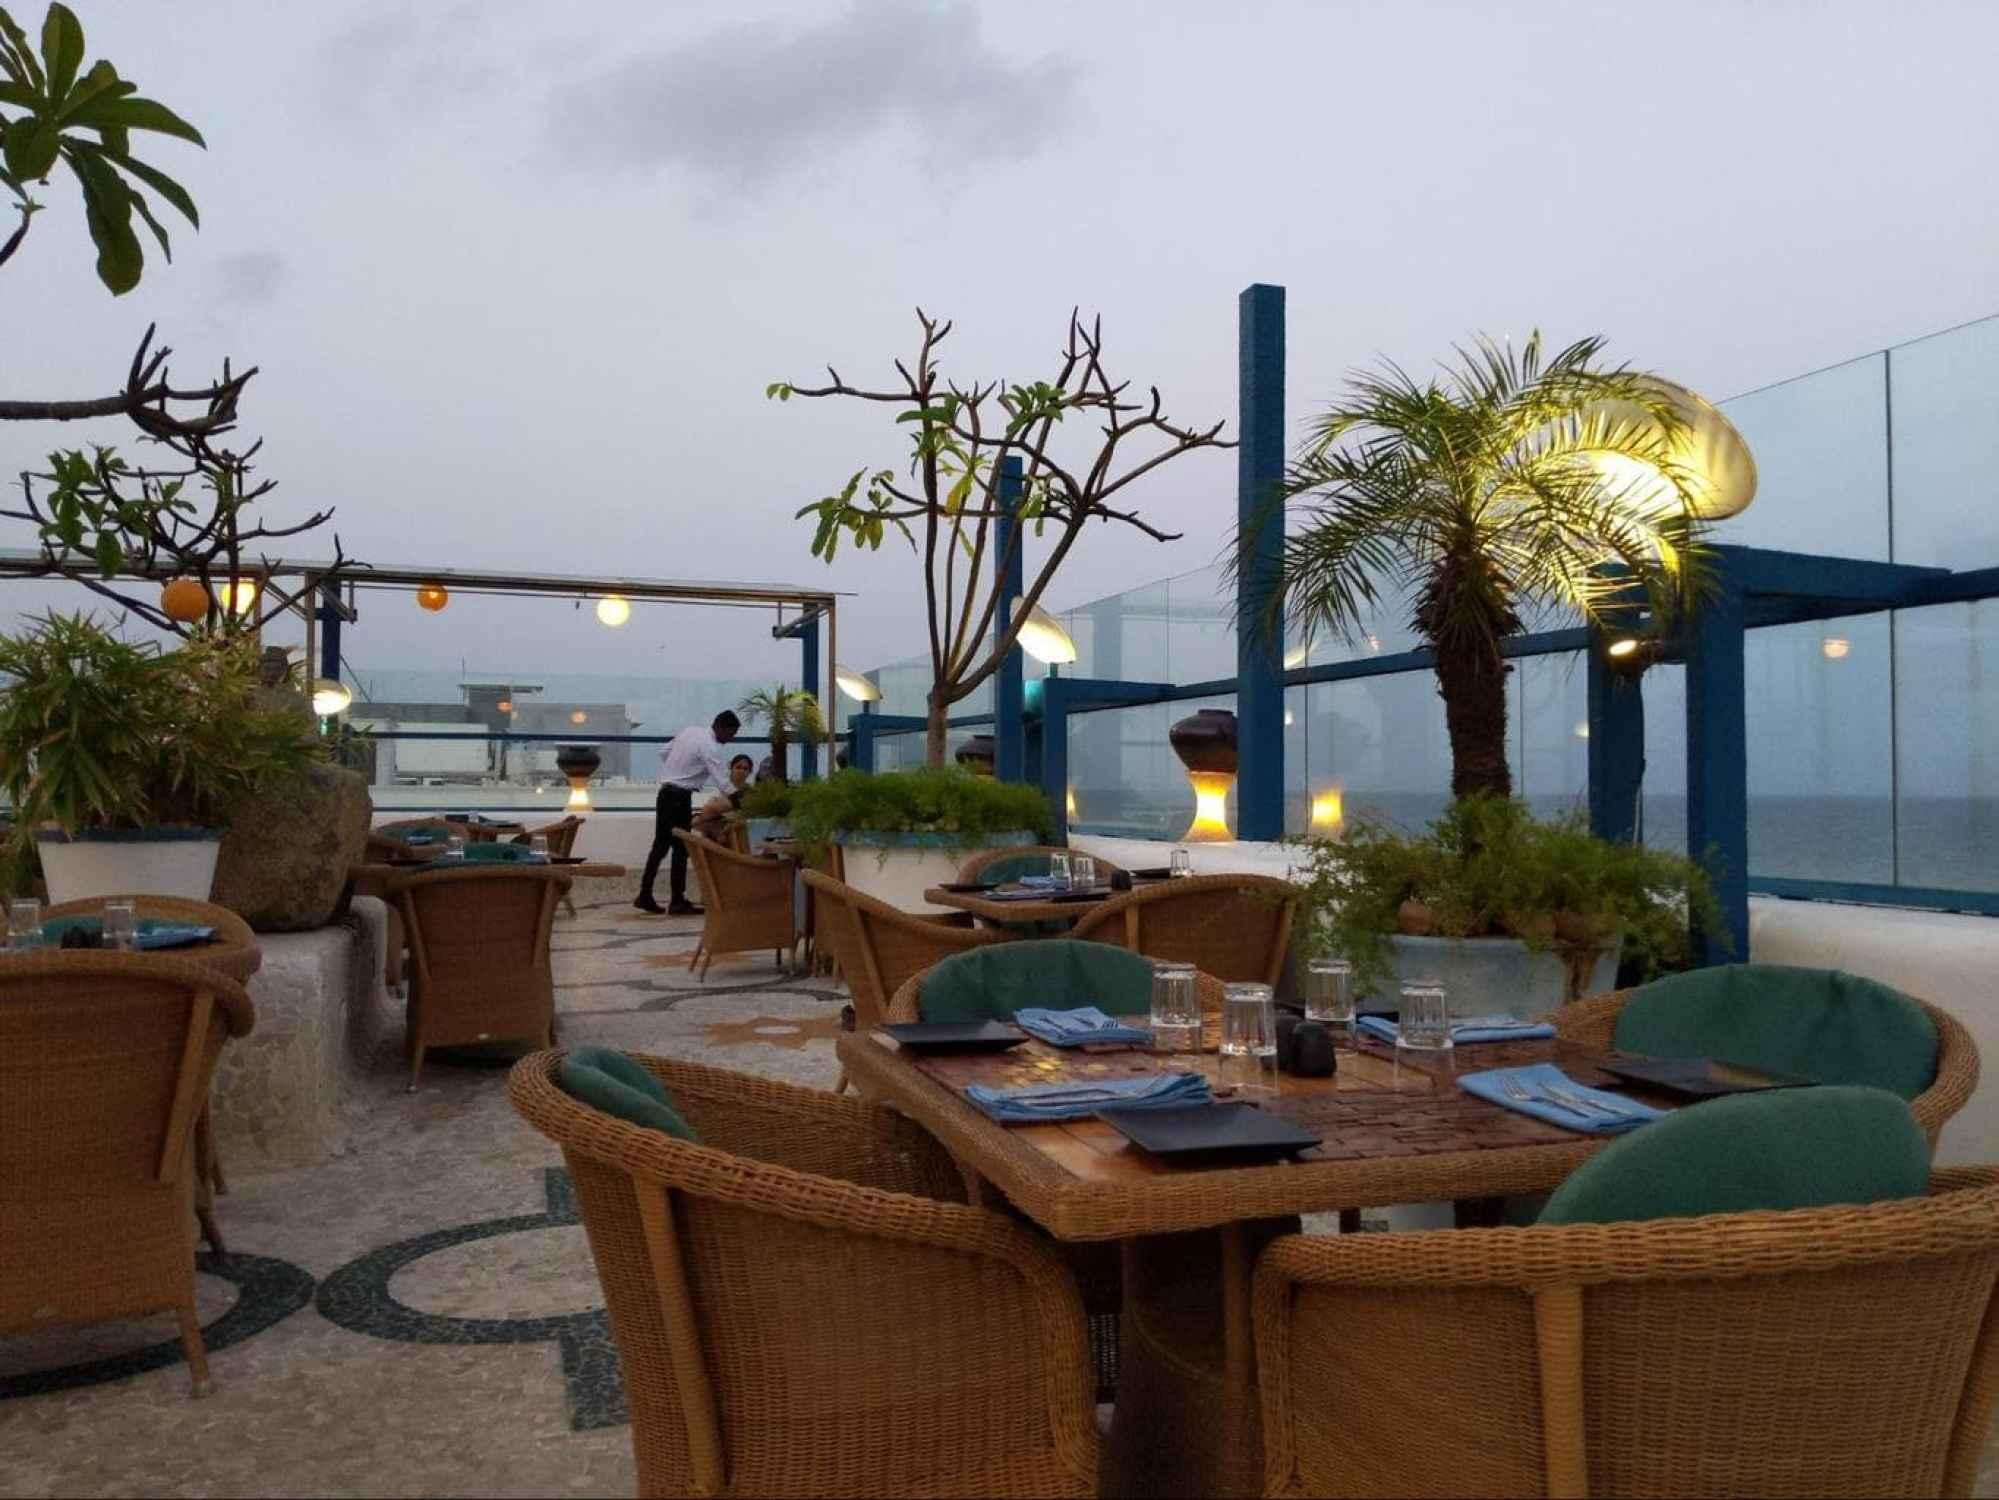 Promenade Hotel rooftop